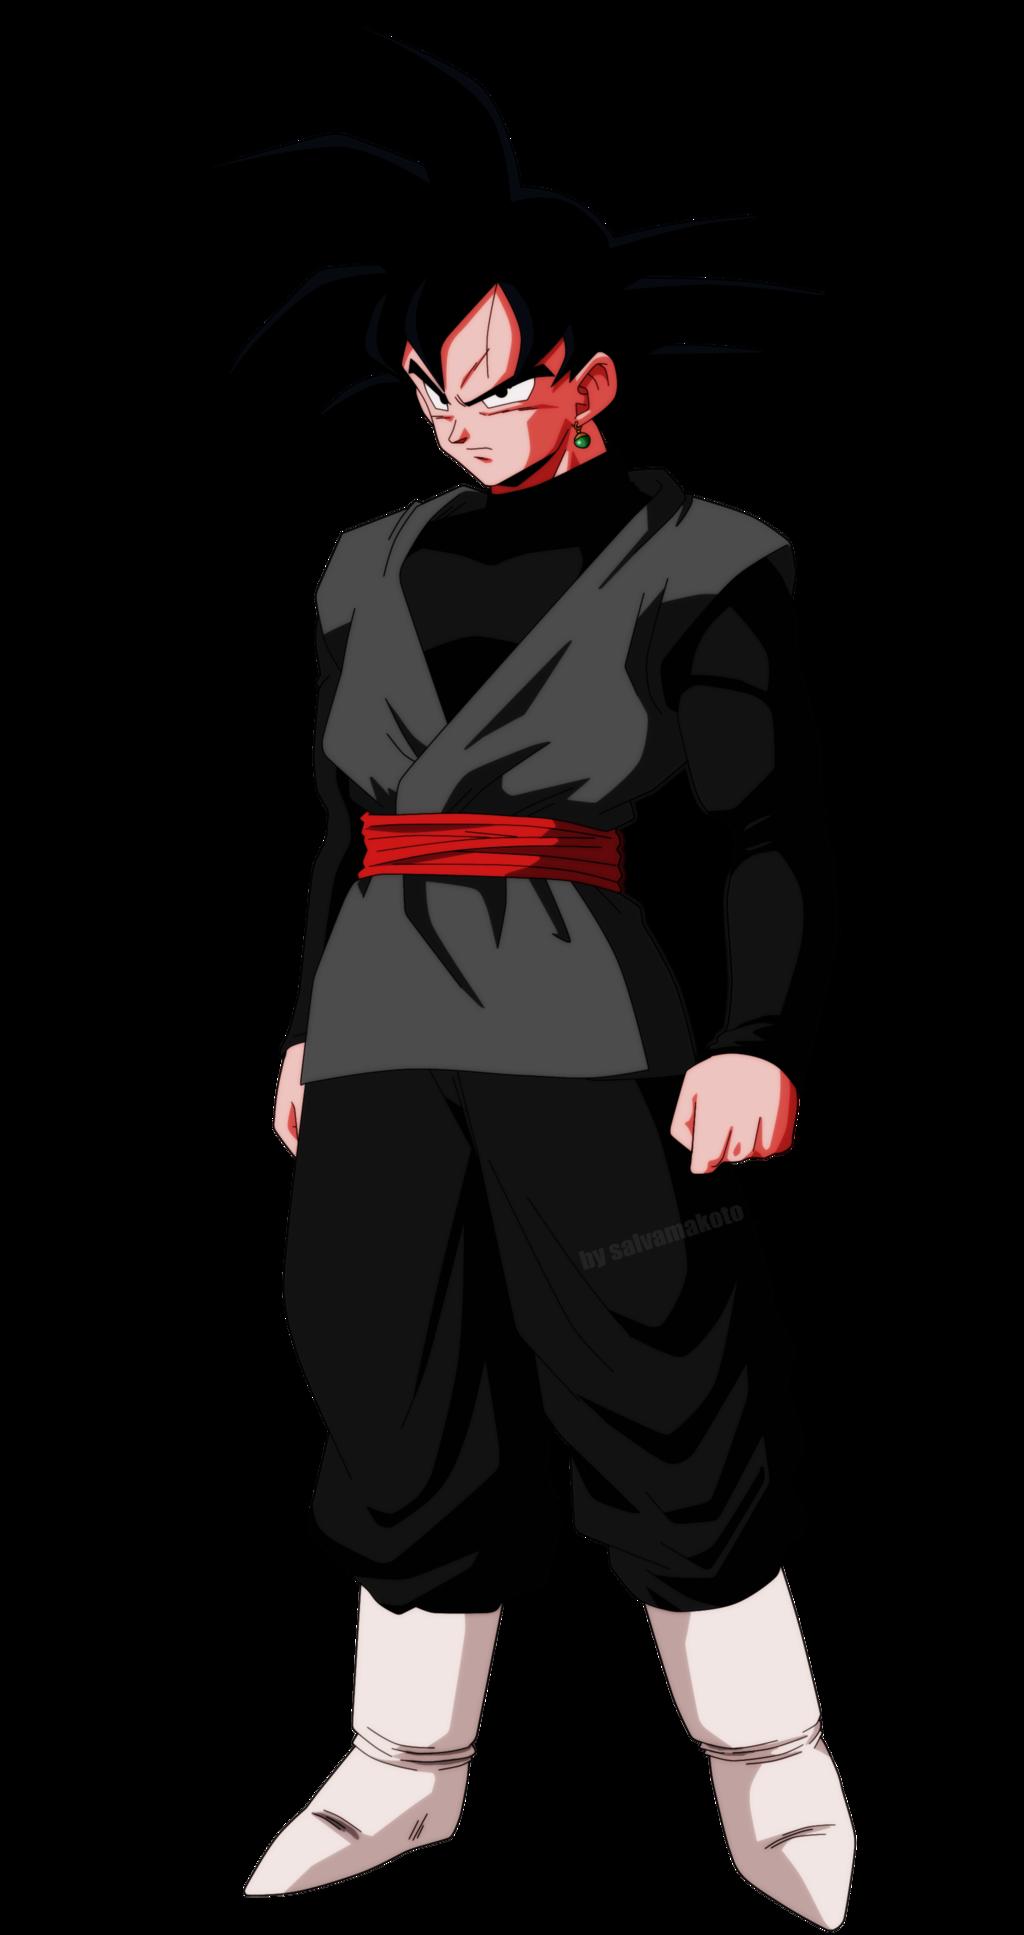 Black Goku By Salvamakoto On Deviantart Goku Black Anime Dragon Ball Super Dragon Ball